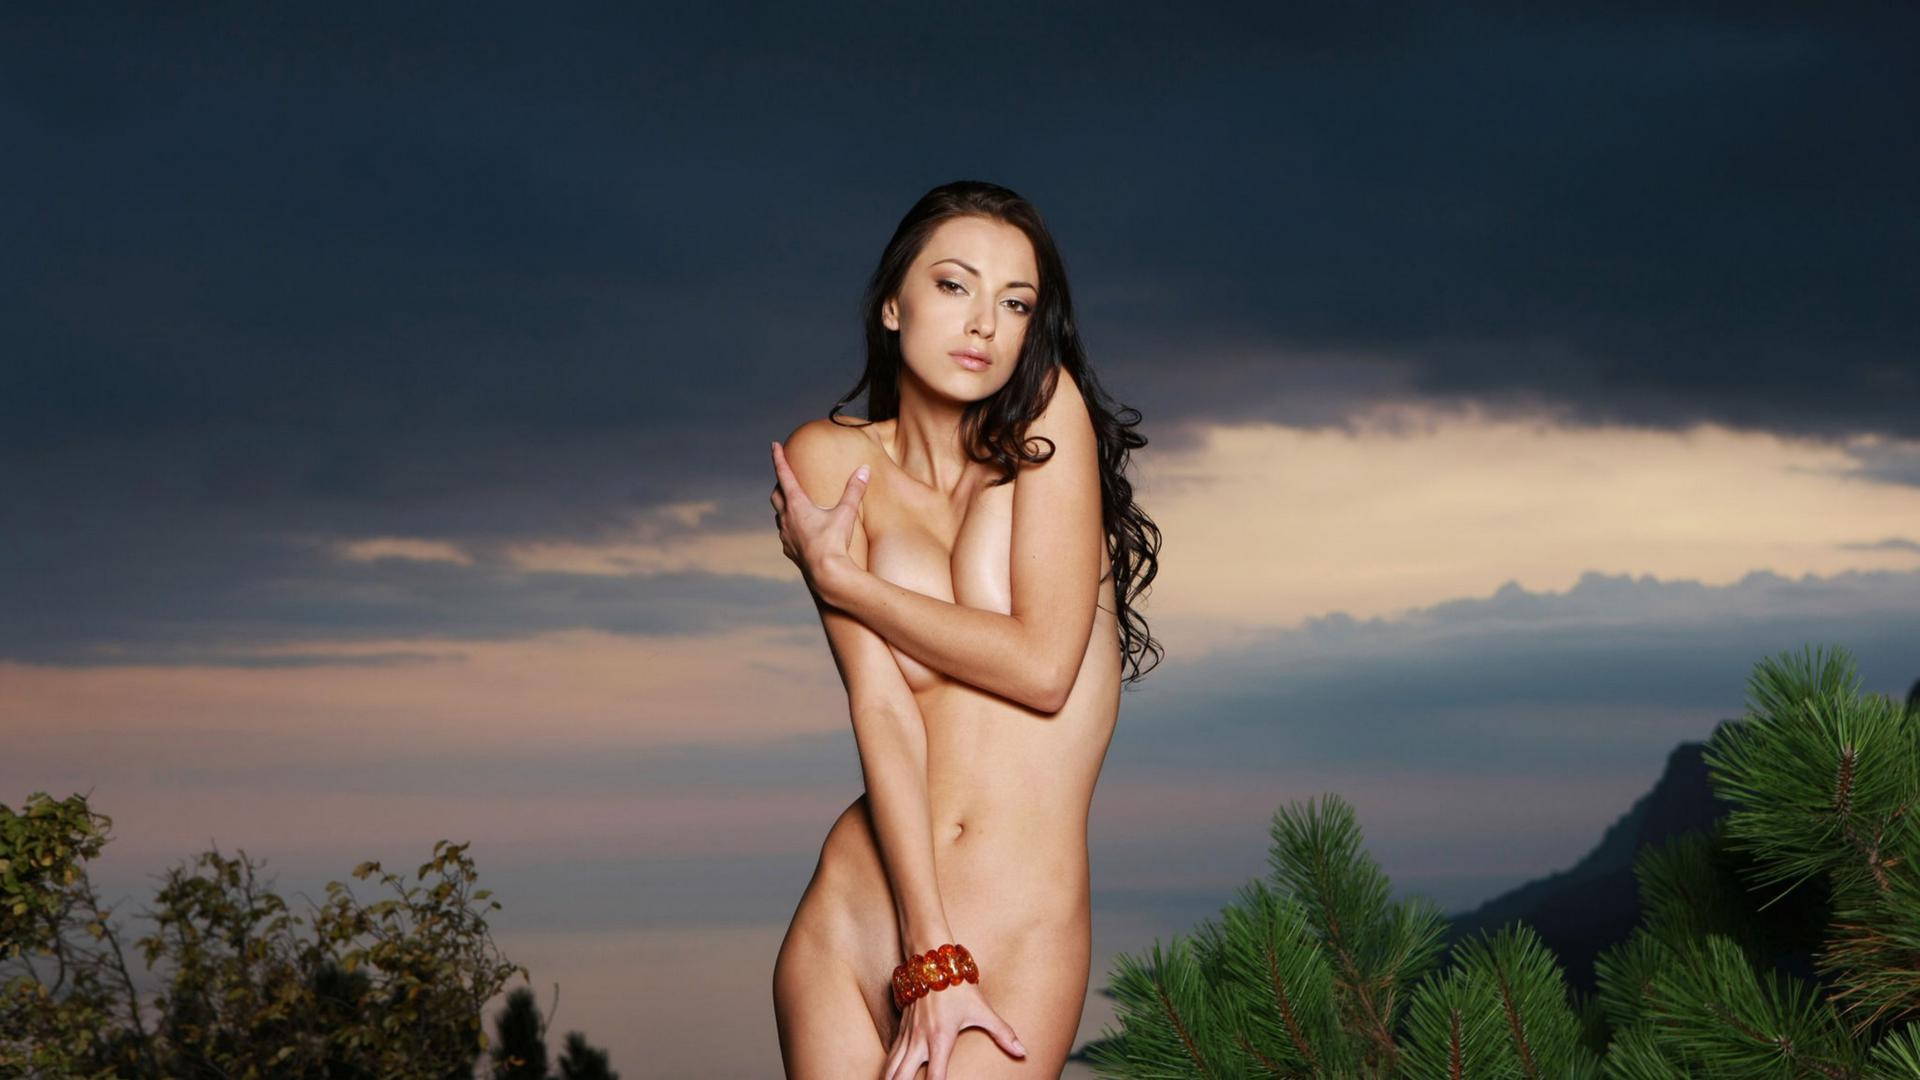 Download photo 1920x1080, anna aj, natural, brunette ...